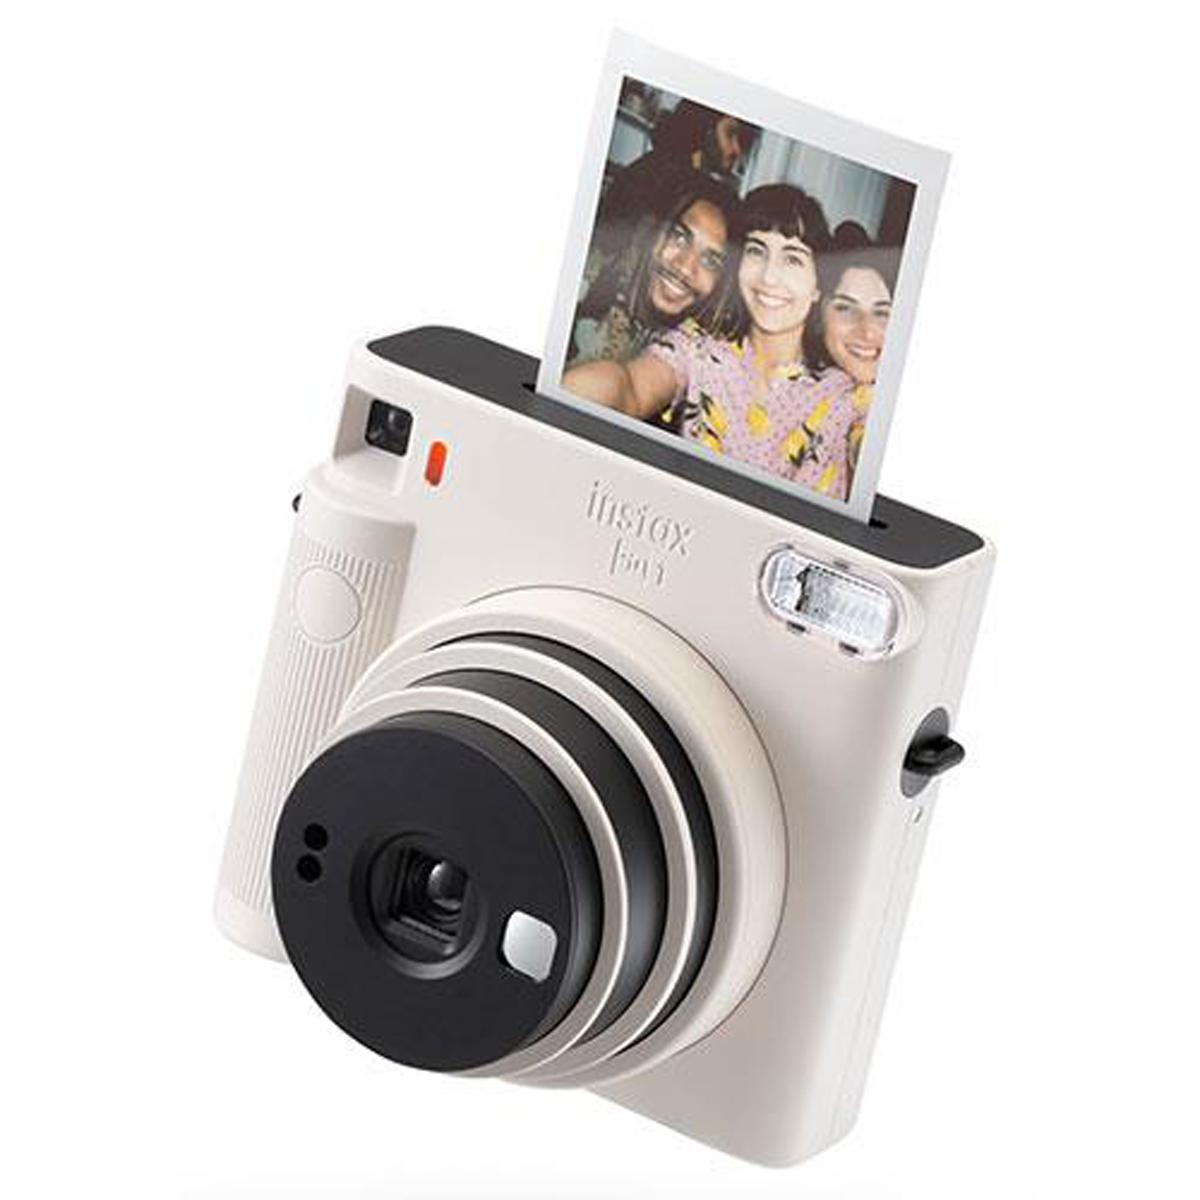 Fujifilm Instax SQUARE SQ1 Press Images Leaks